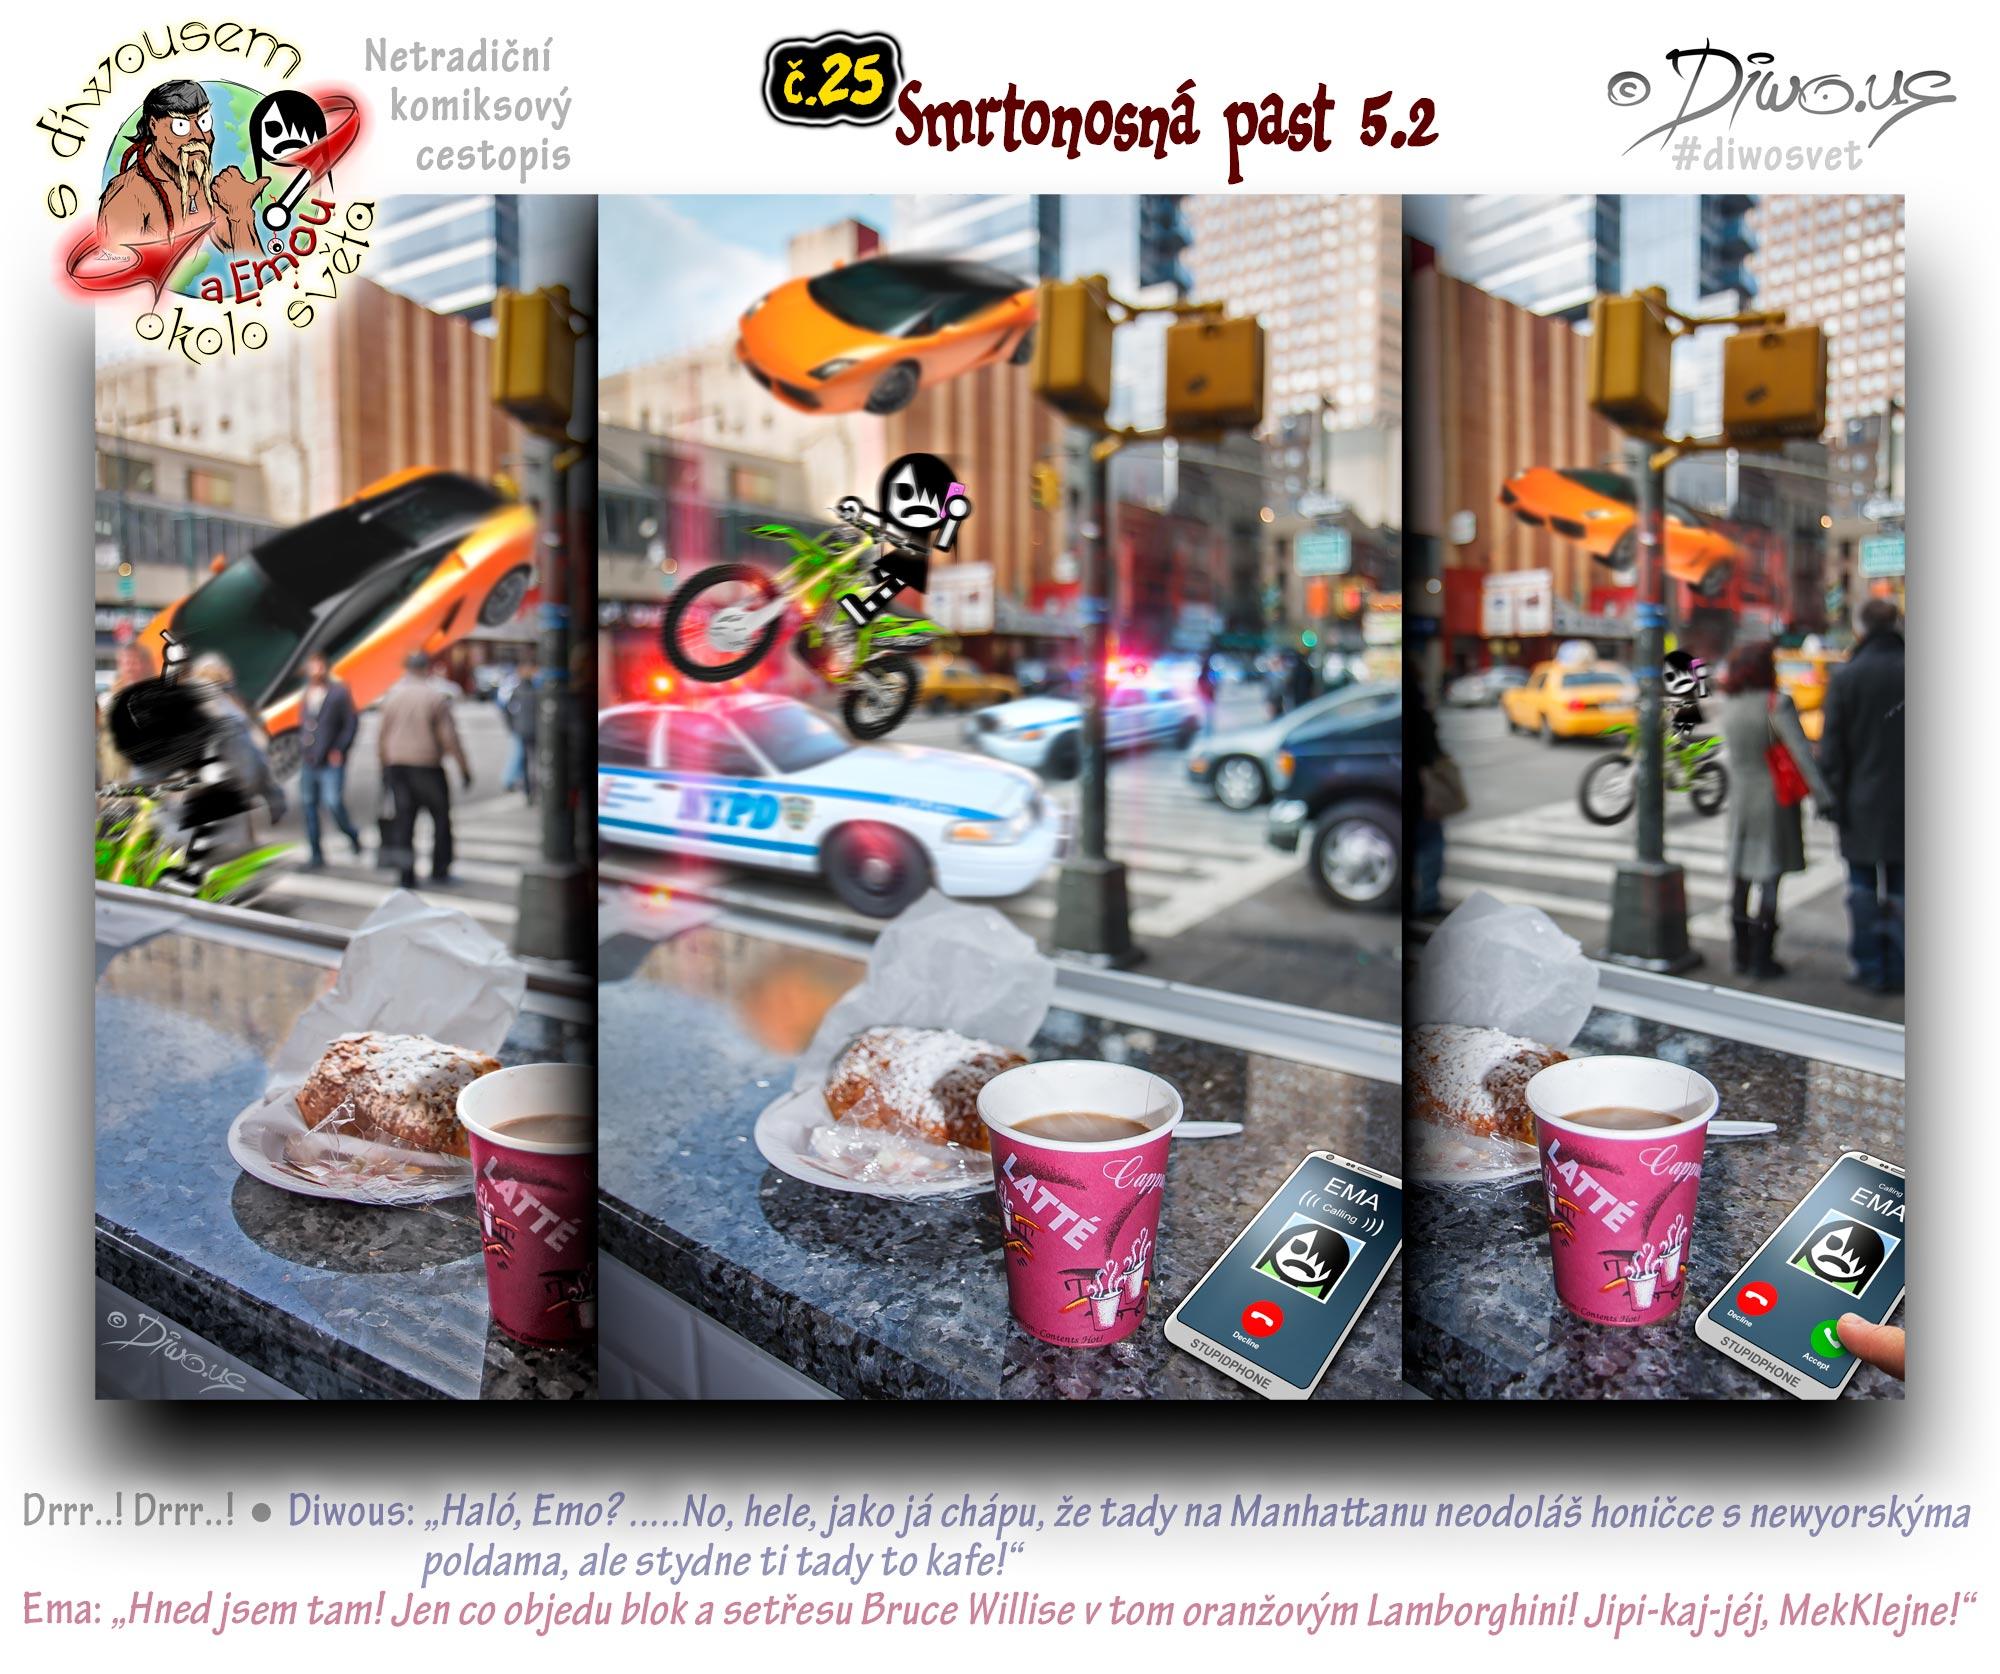 Diwous - netradiční komiksový cestopis, Ema, Manhattan, ulice, avenue, kavárna, kafe, zákusek, honička, Smrtonosná past 5.2, flying, Lamborghini Gallardo, NYPD car, cops, police, car chase, streets, cafe, latté, dessert, Kawasaki dirt bike, smartphone, stupidphone, LG, Die Hard 5.5, John McClane, Bruce Willis, Yippee Ki-Yay Motherfucker